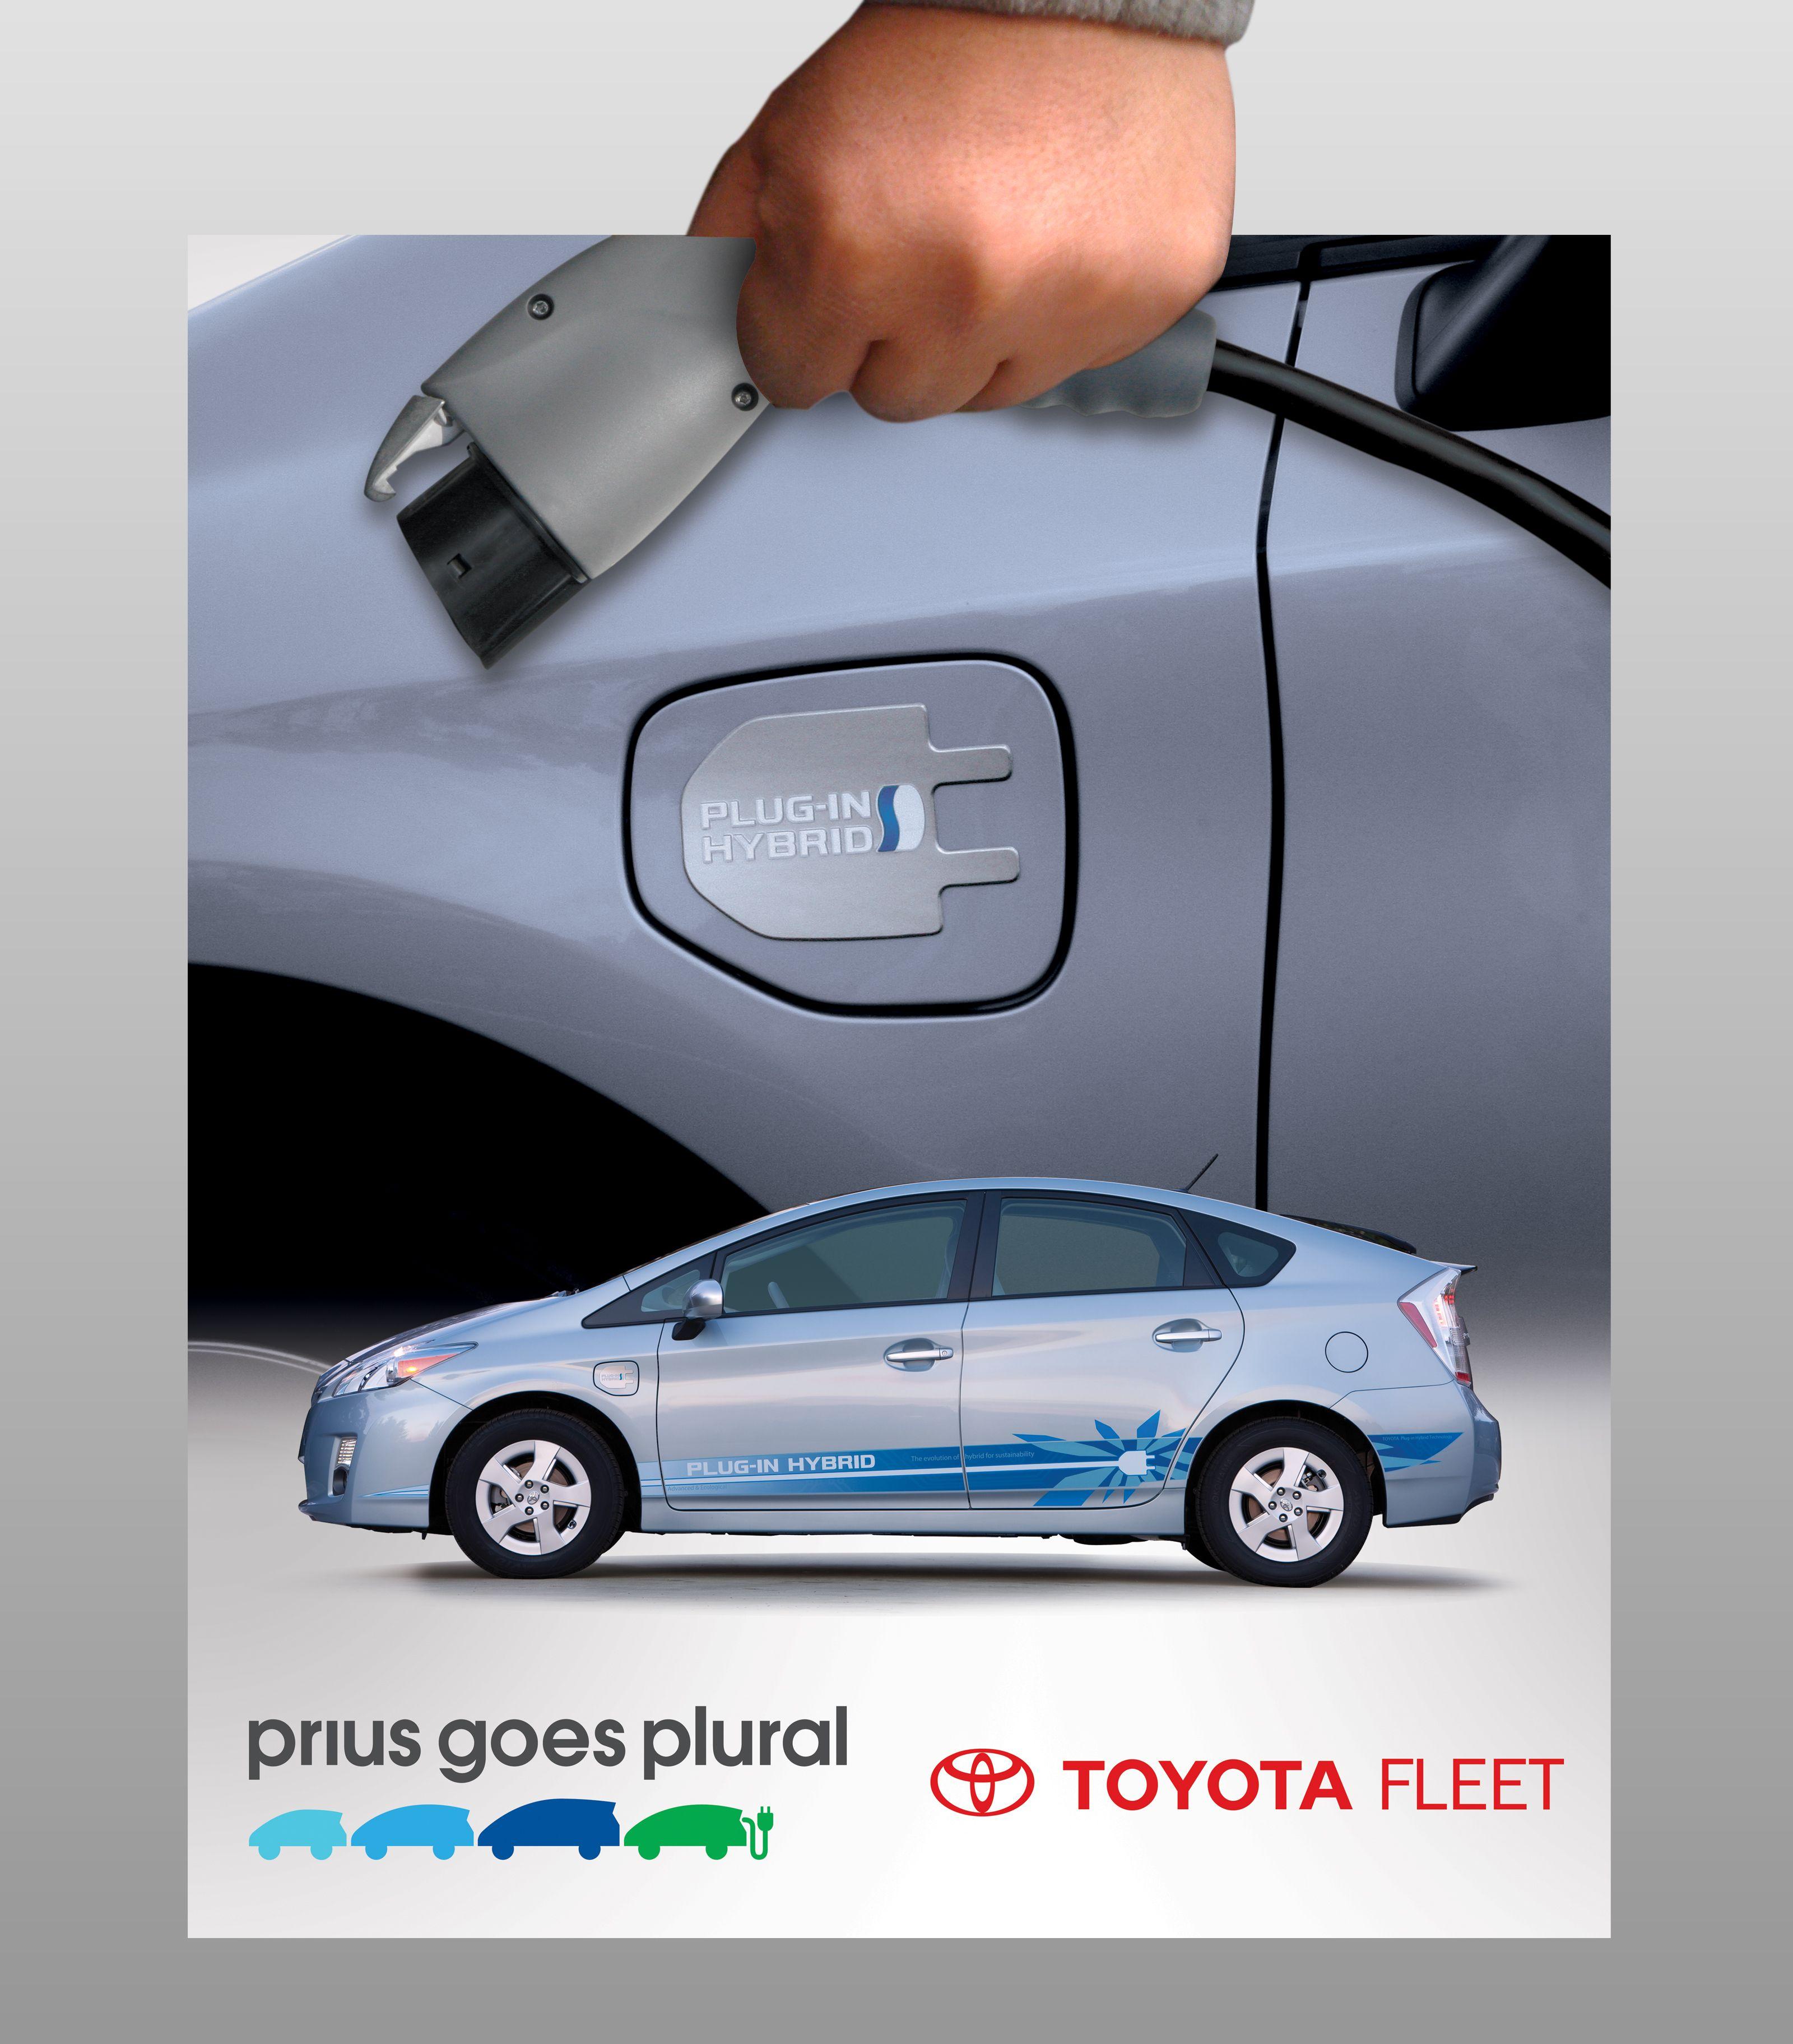 Toyota Fleet Prius Plug In Bag Buy New Toyota Cars